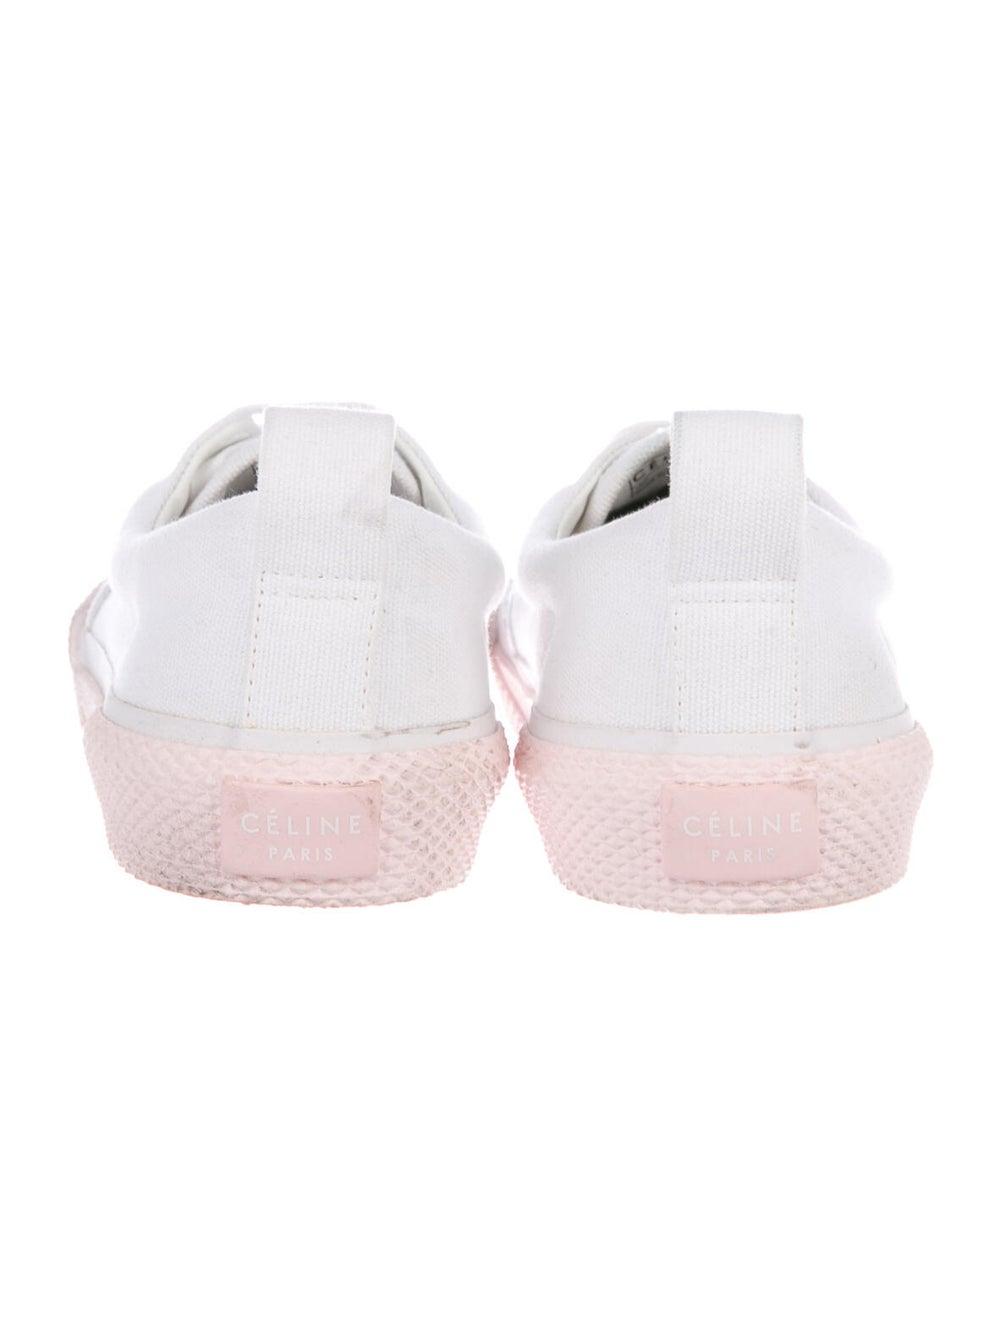 Celine 180 Sneakers White - image 4